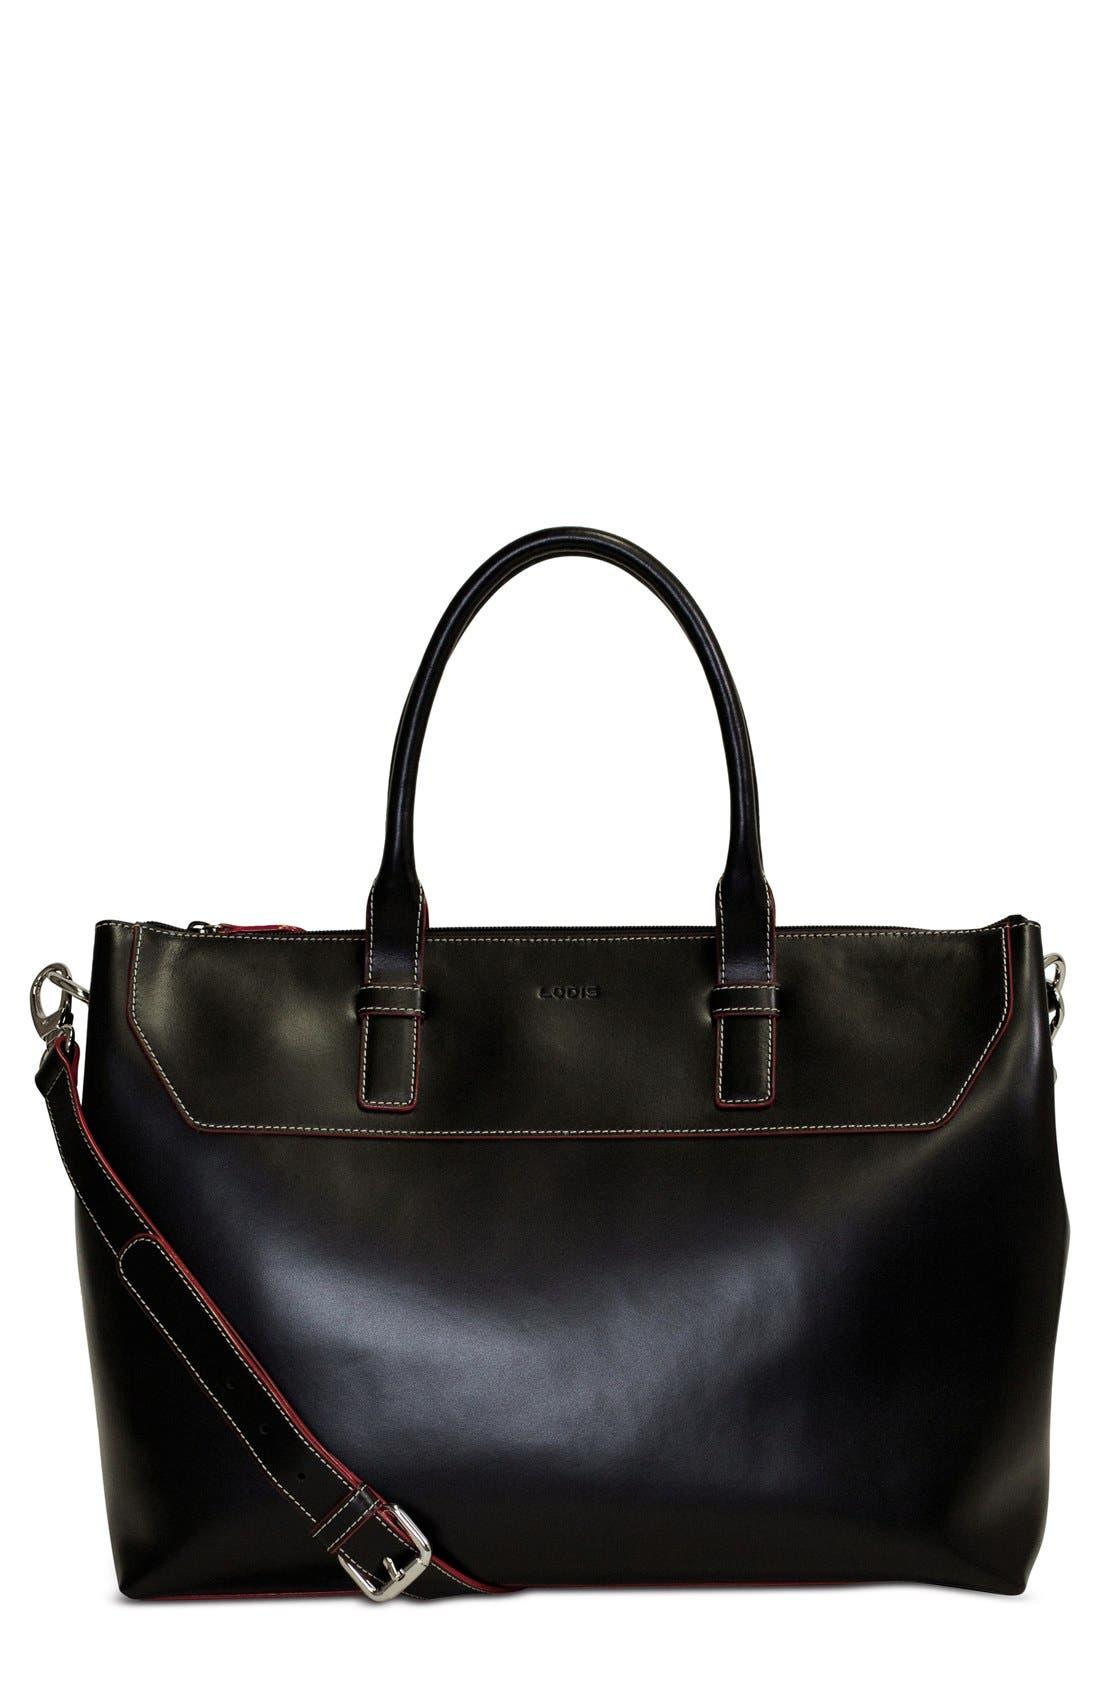 Alternate Image 1 Selected - Lodis Audrey Wilhelmina Leather Work Satchel